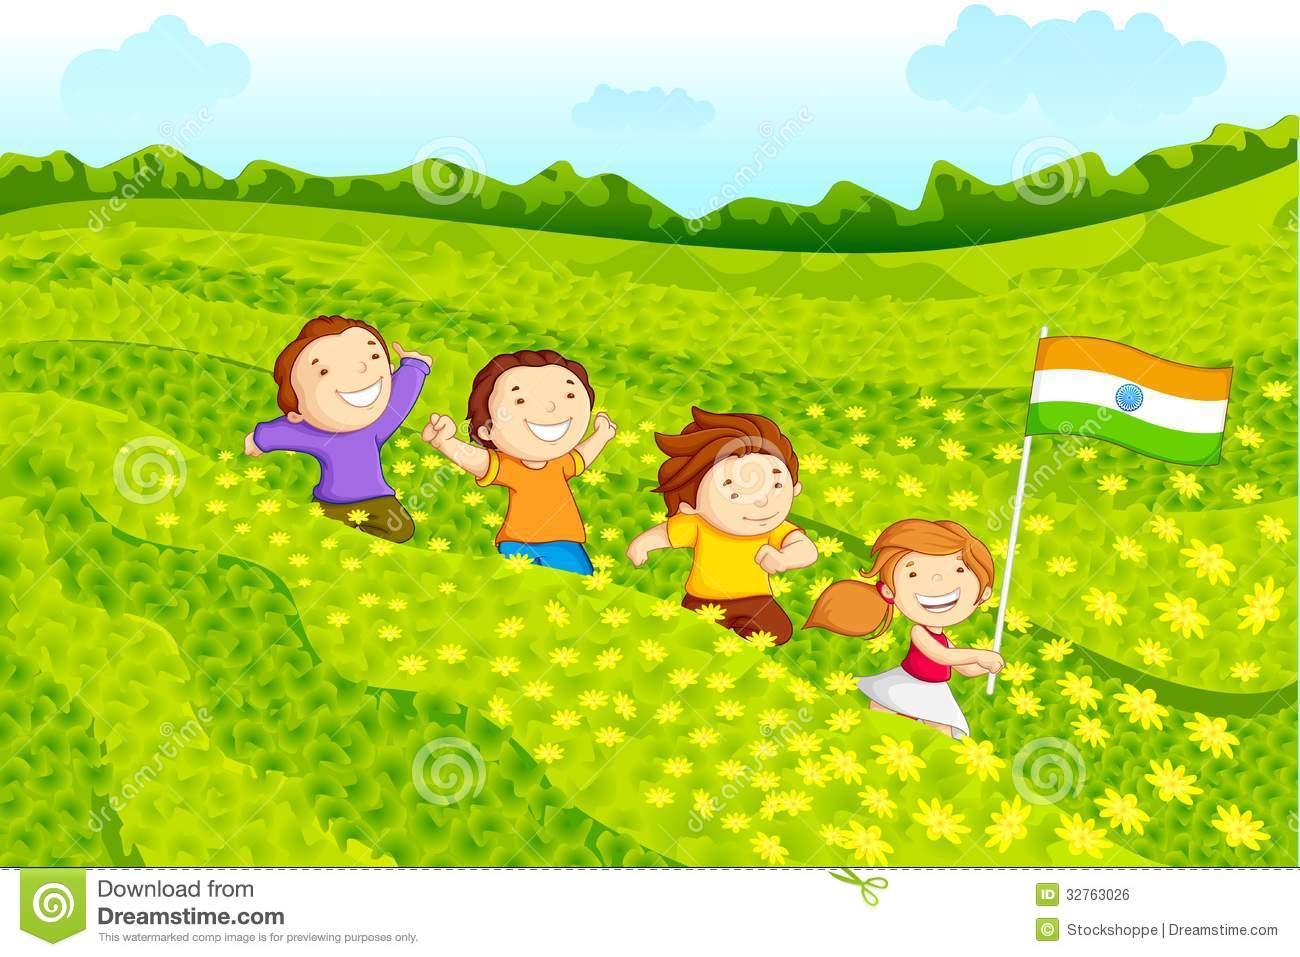 Indian clipart patriotism Flag Kids holding Child Royalty